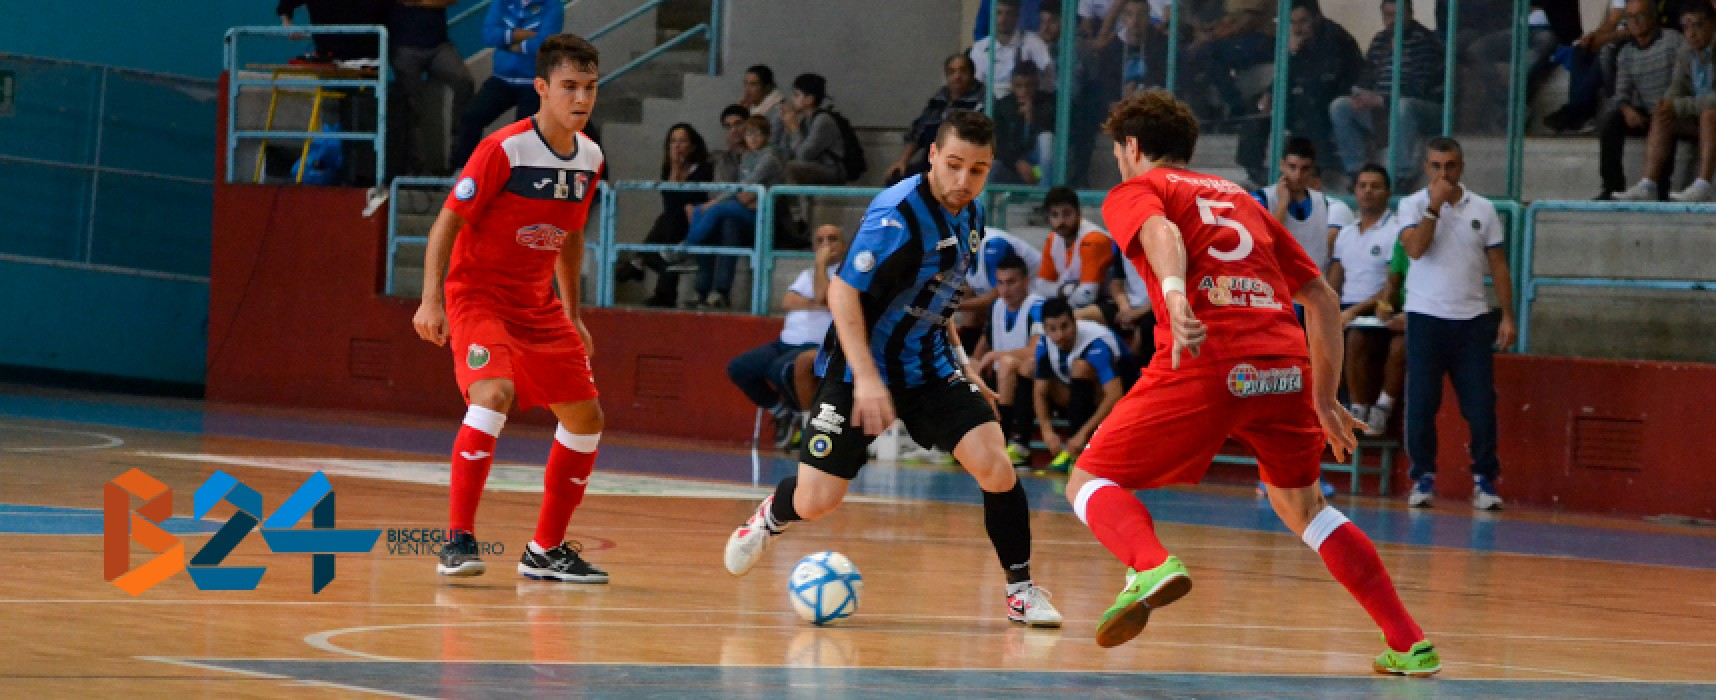 FINALE: Futsal Bisceglie – Sammichele 7-3